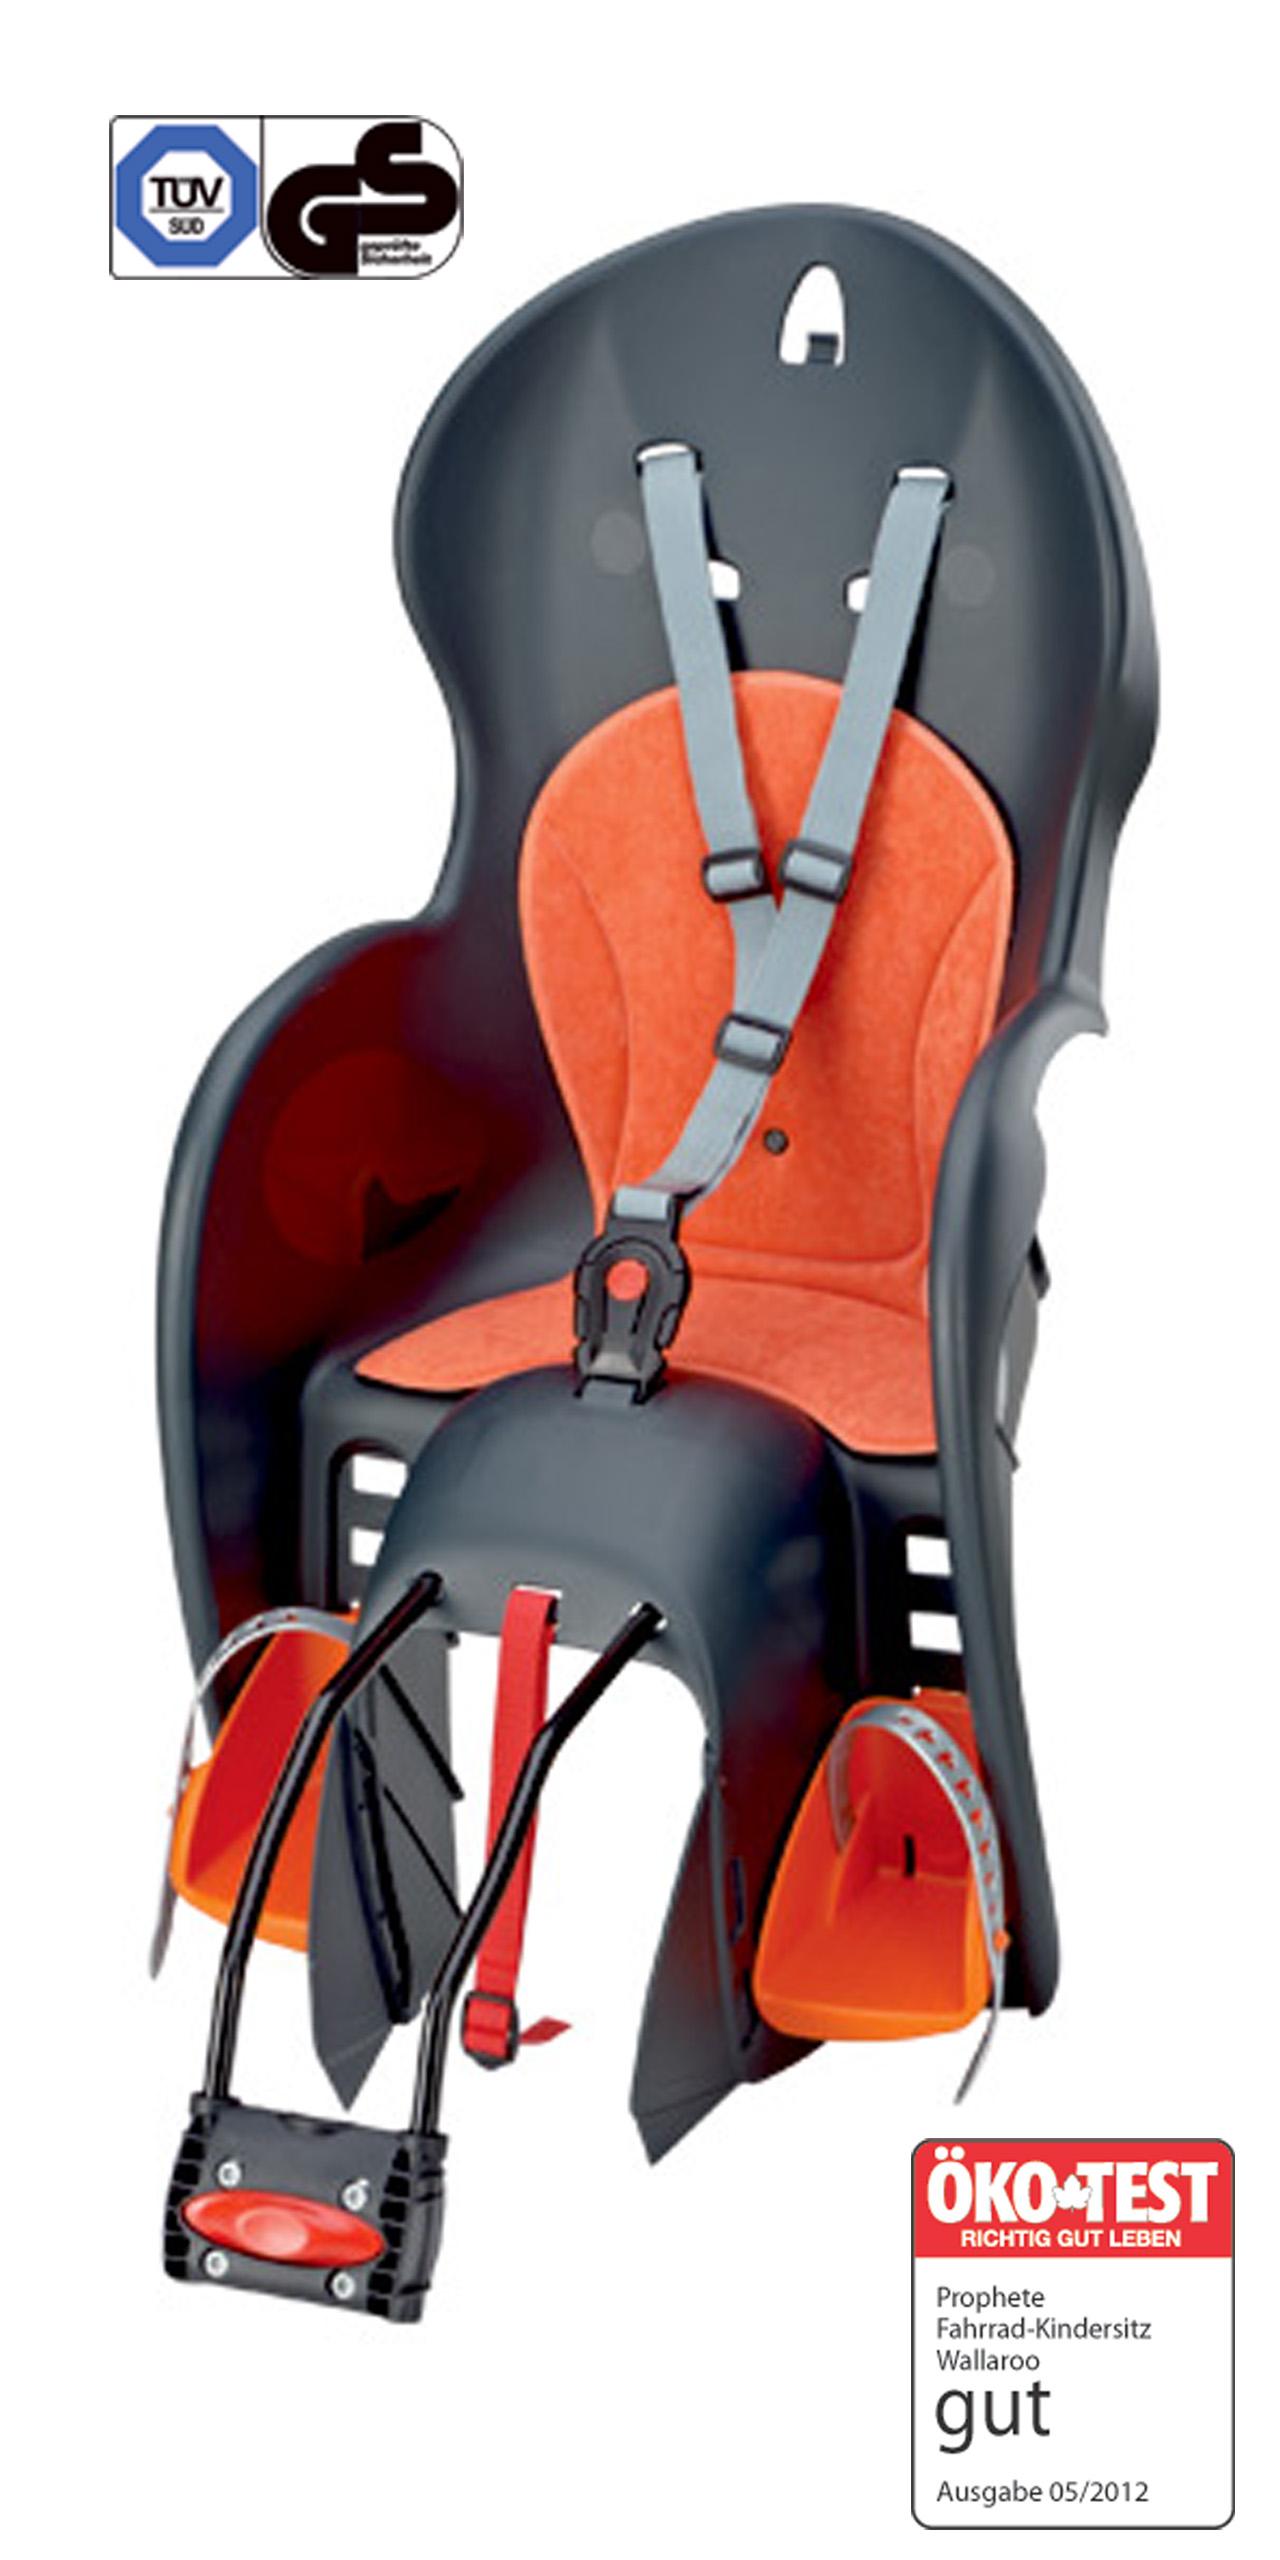 fahrrad kindersitz wallaroo mit rahmenhalterung. Black Bedroom Furniture Sets. Home Design Ideas